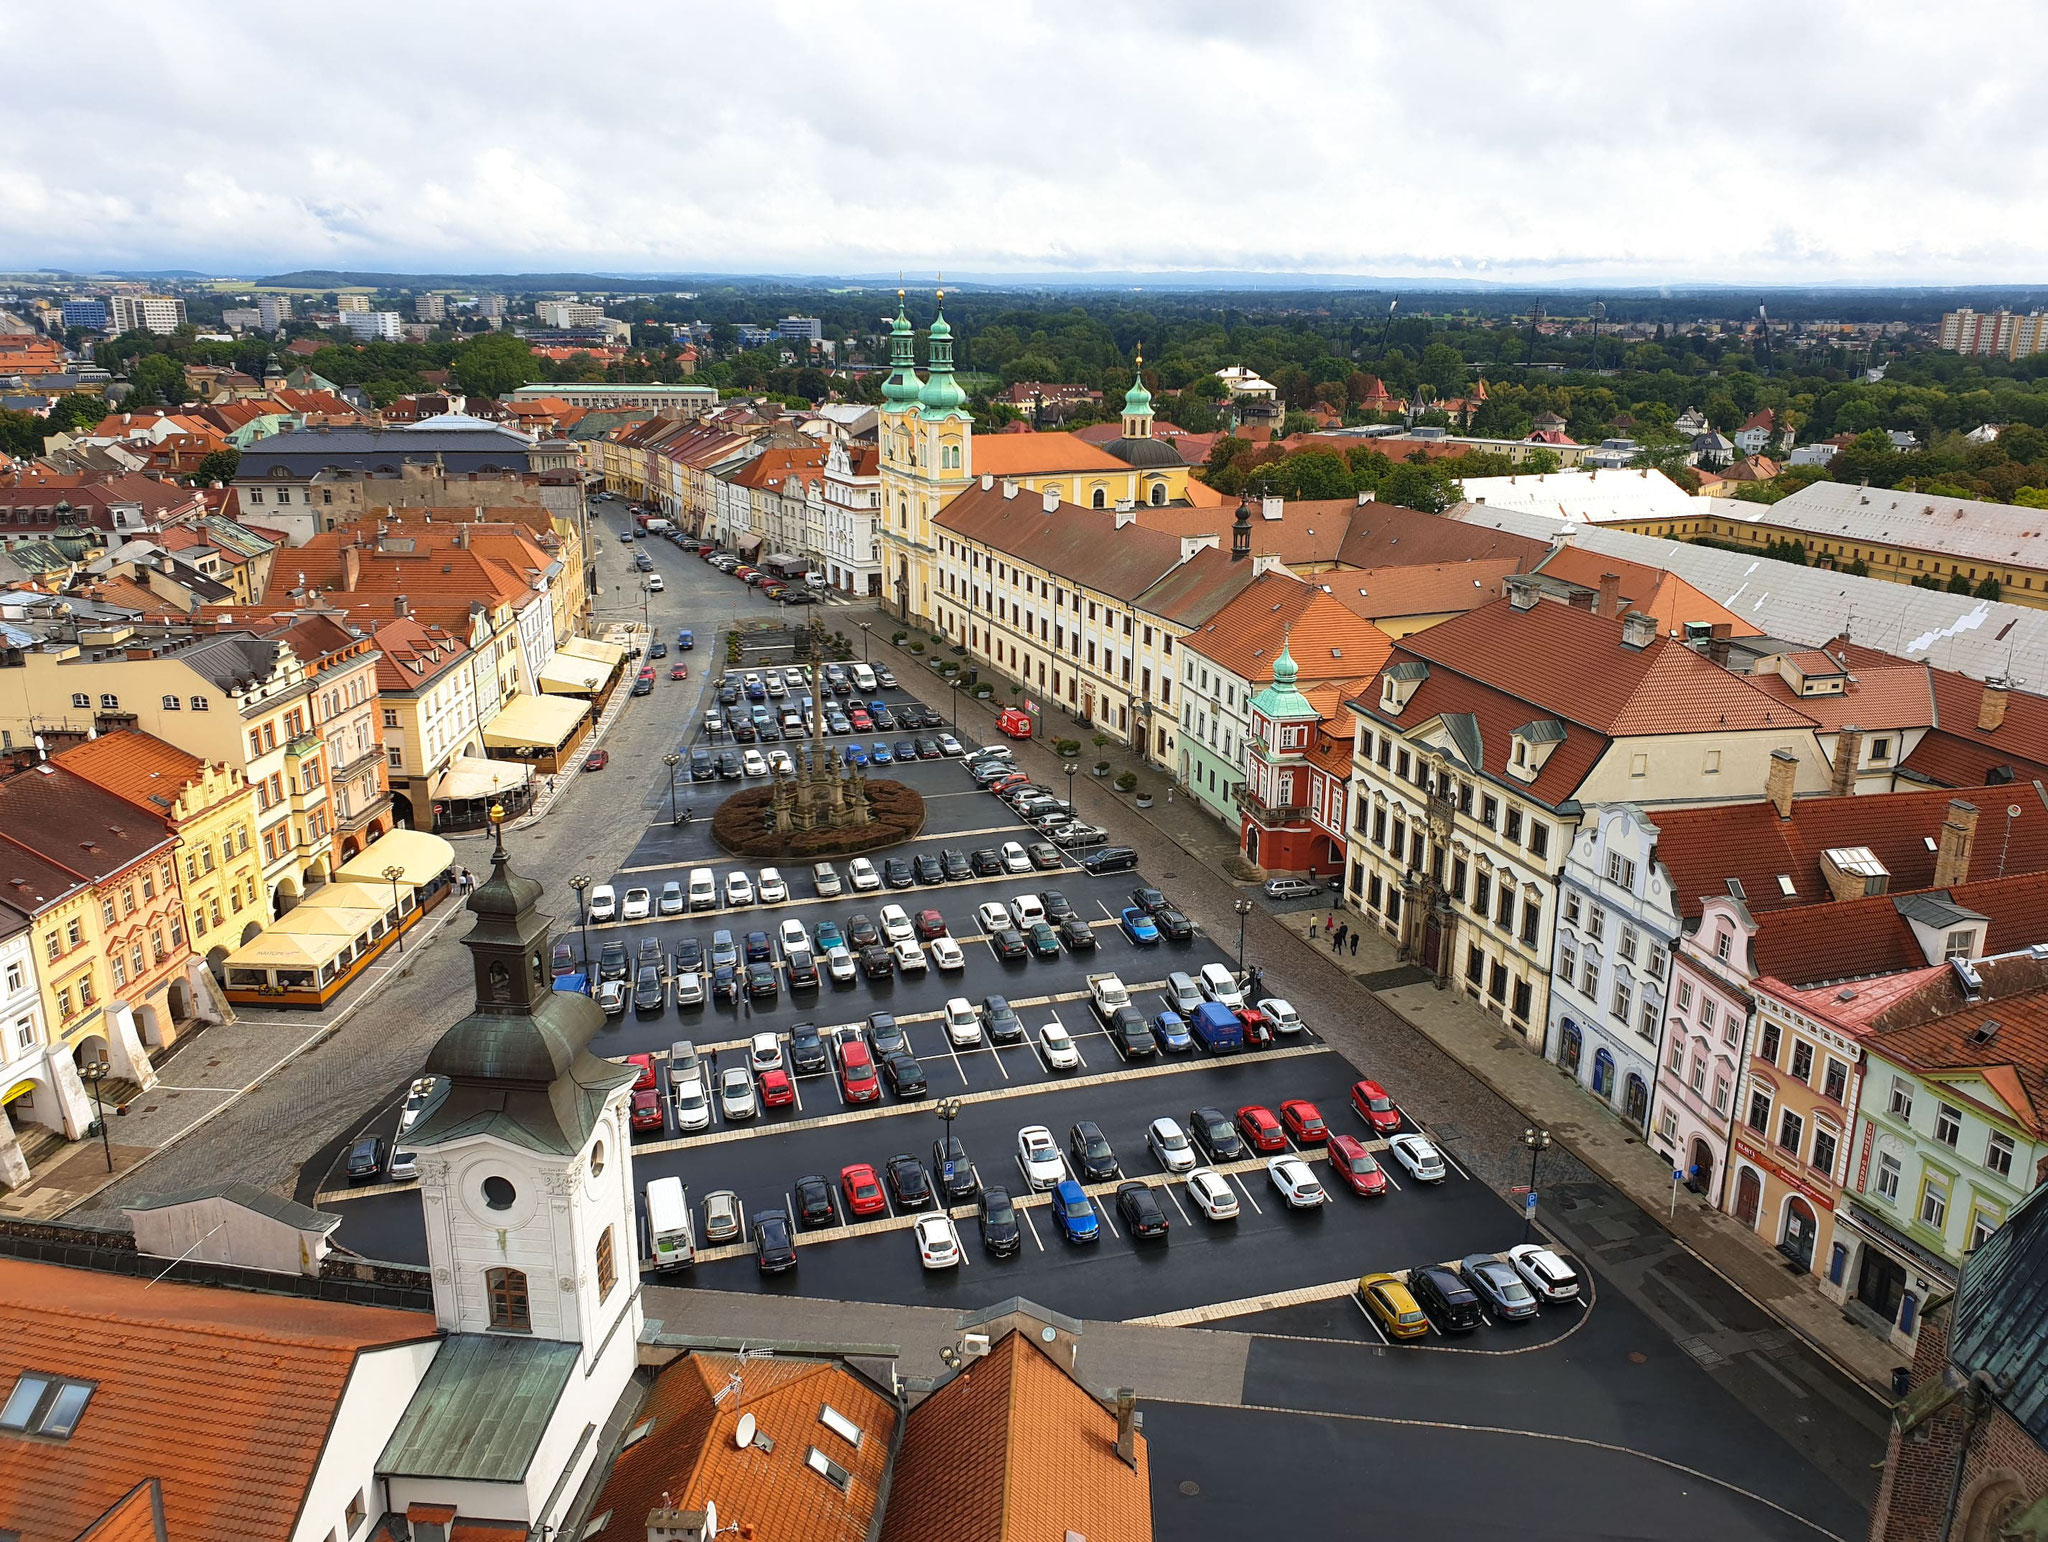 Hradec Králové, Weißer Turm, Aussicht zum Marktplatz